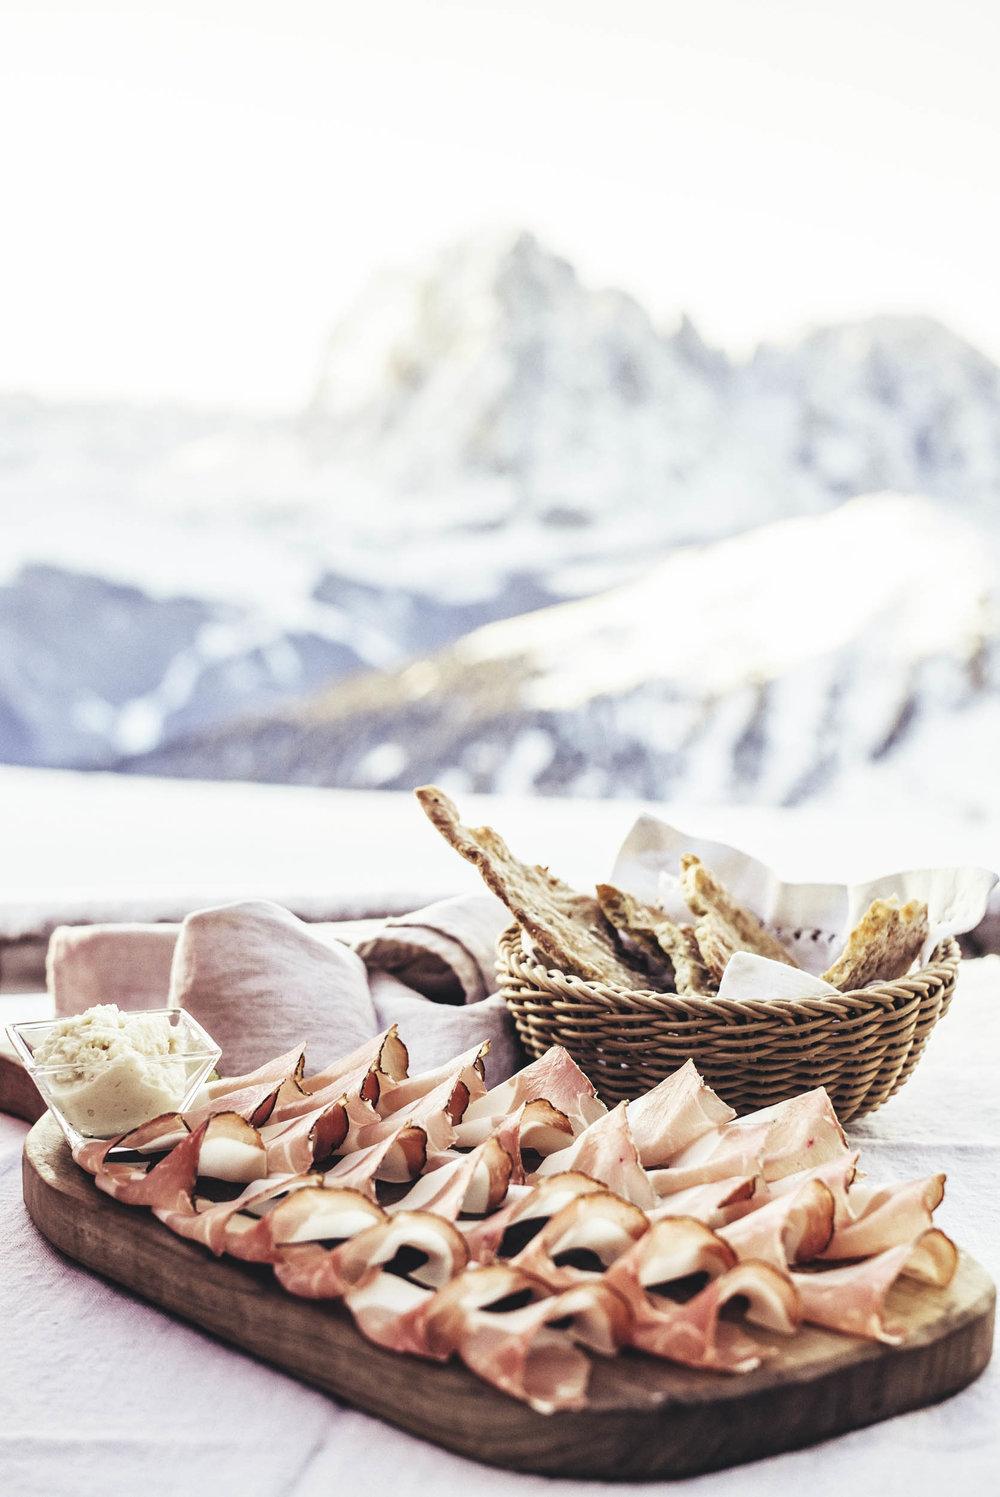 seifertuebler-lifestyle-suedtirol-winter-tourism-ski-dolomites02.jpg